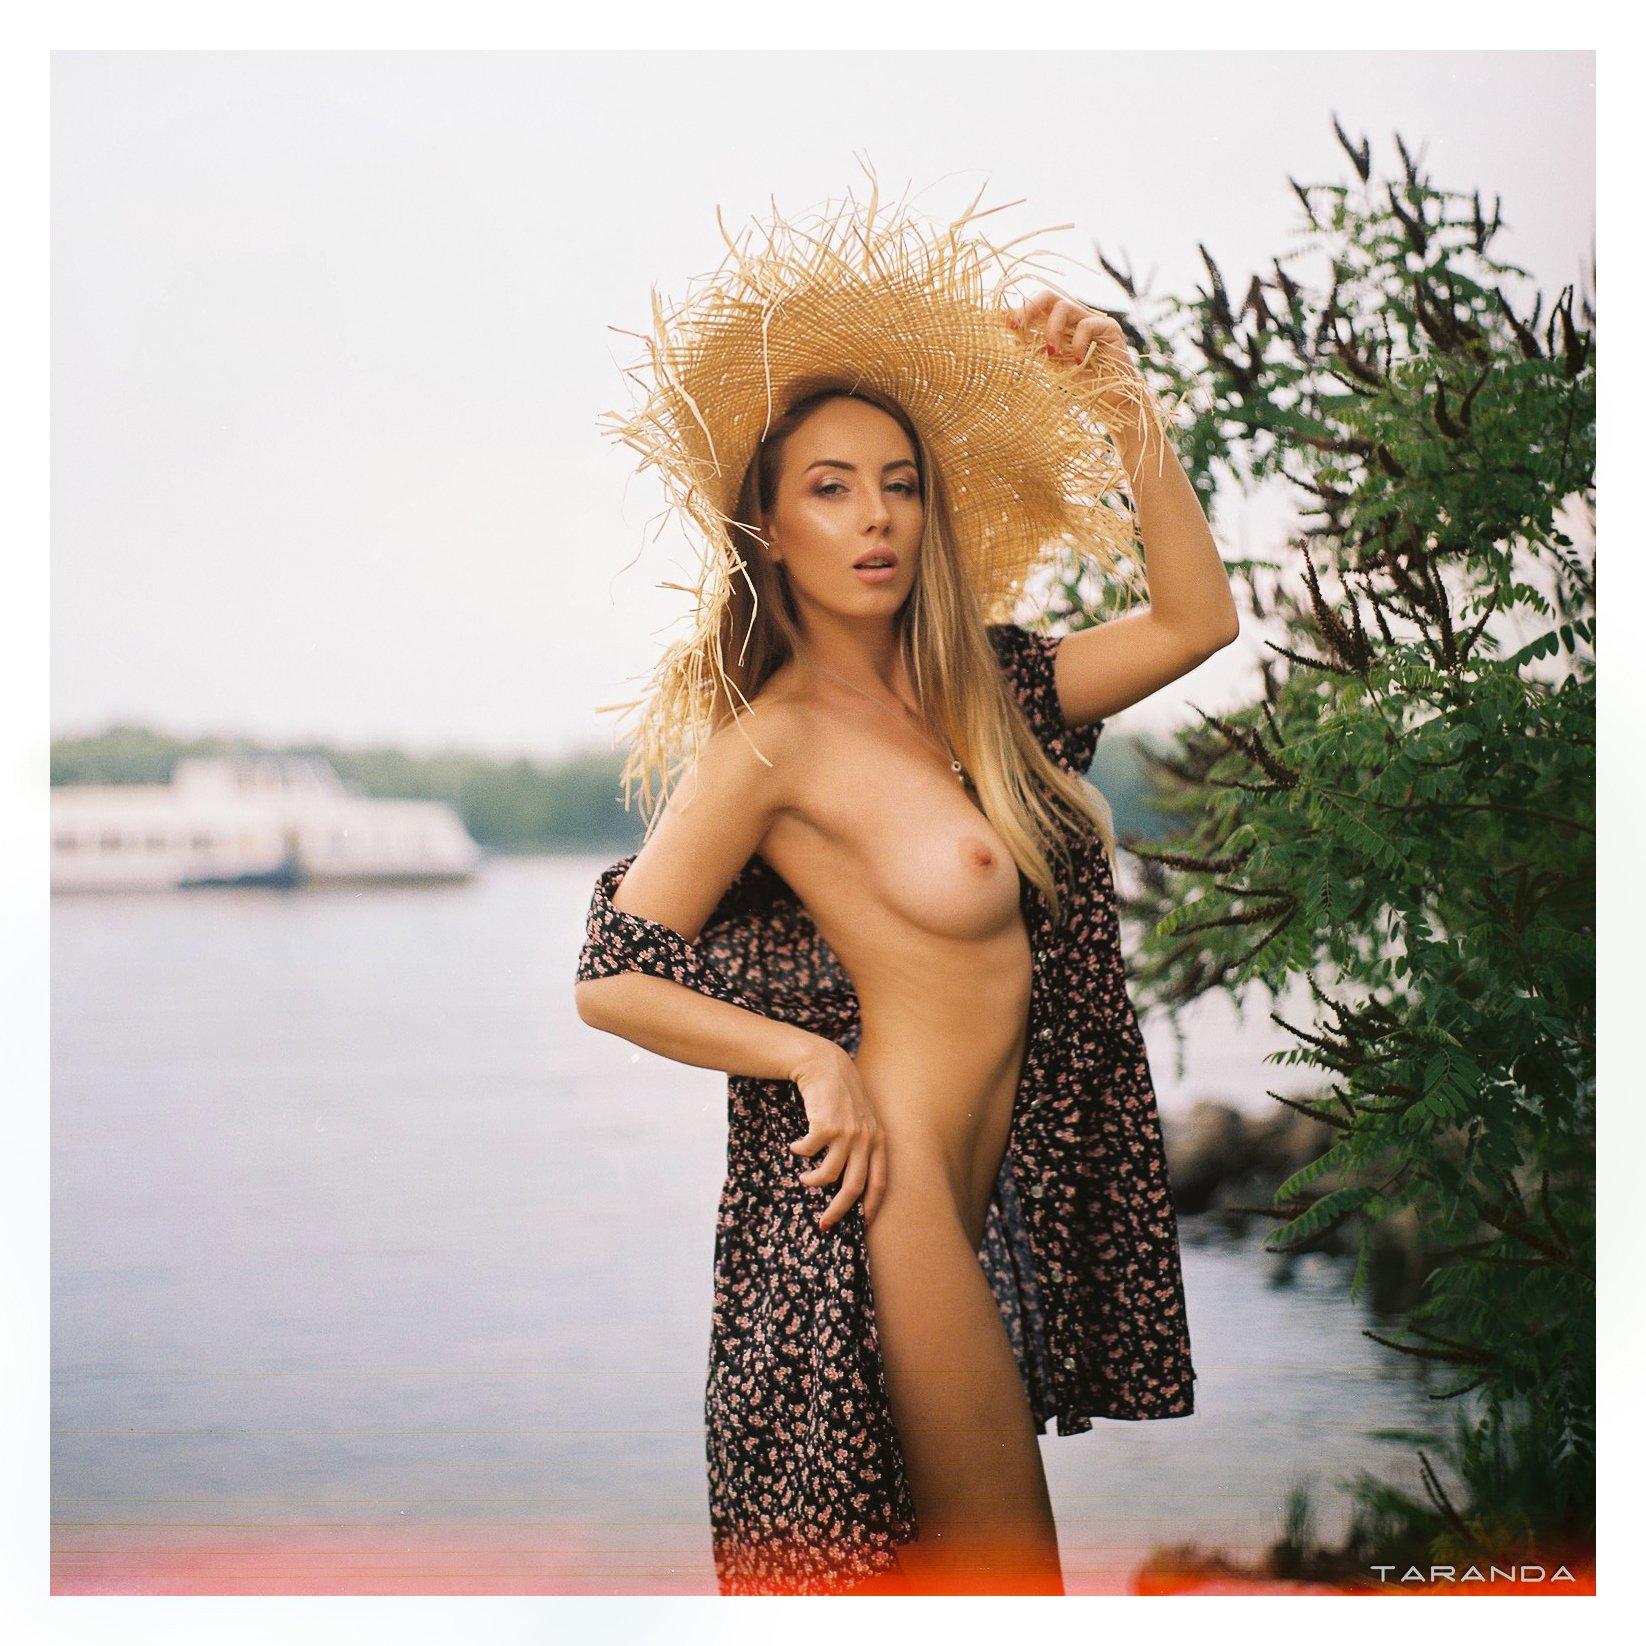 girl, kiev, ukraine, village, portrait, nu, nude, hat, film, kodak, portra, sweet, sexy, Тарас Таранда